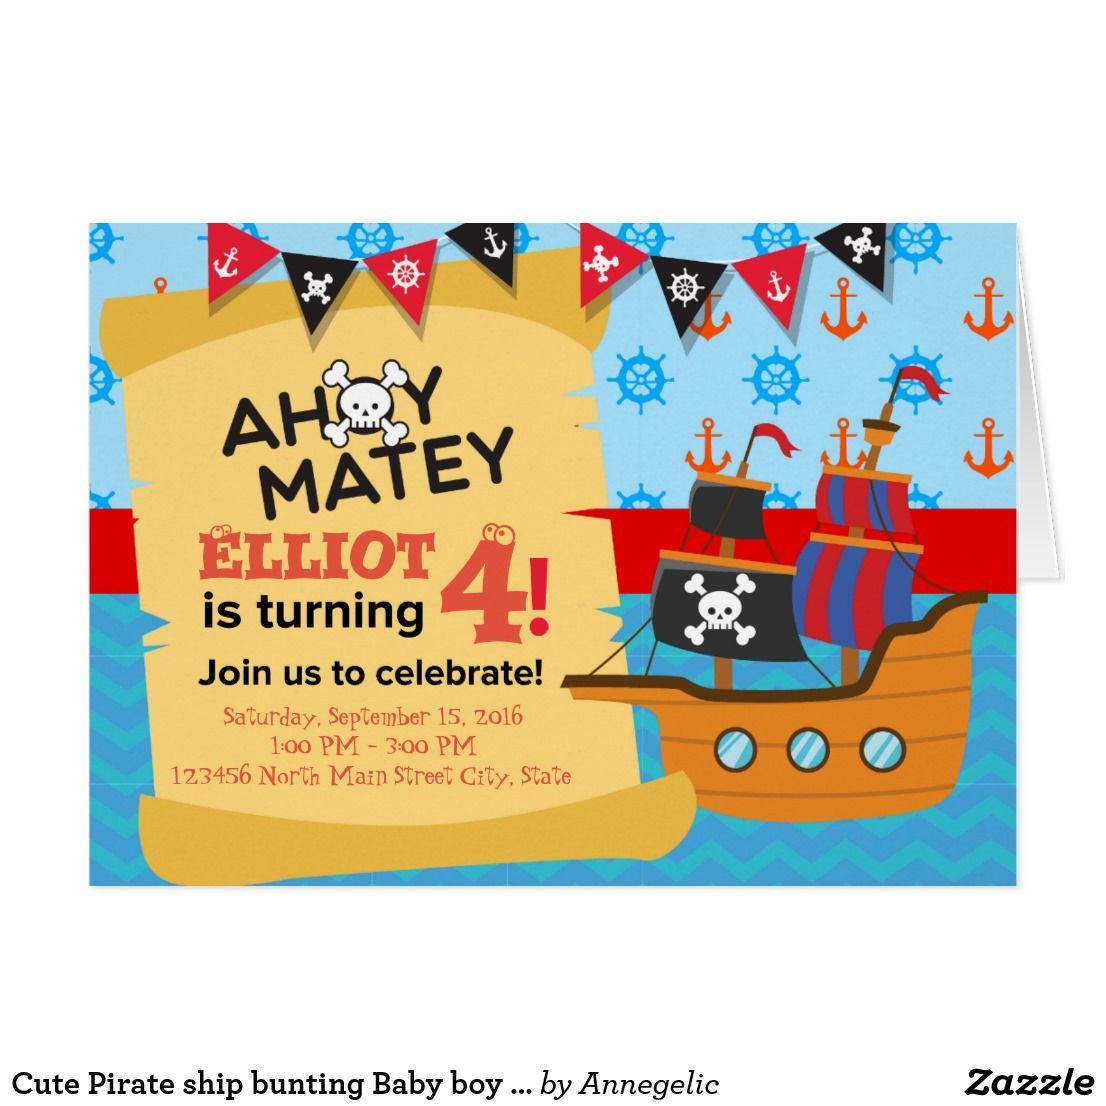 Cute pirate ship bunting baby boy birthday card boy birthday cards cute pirate ship bunting baby boy birthday card bookmarktalkfo Choice Image